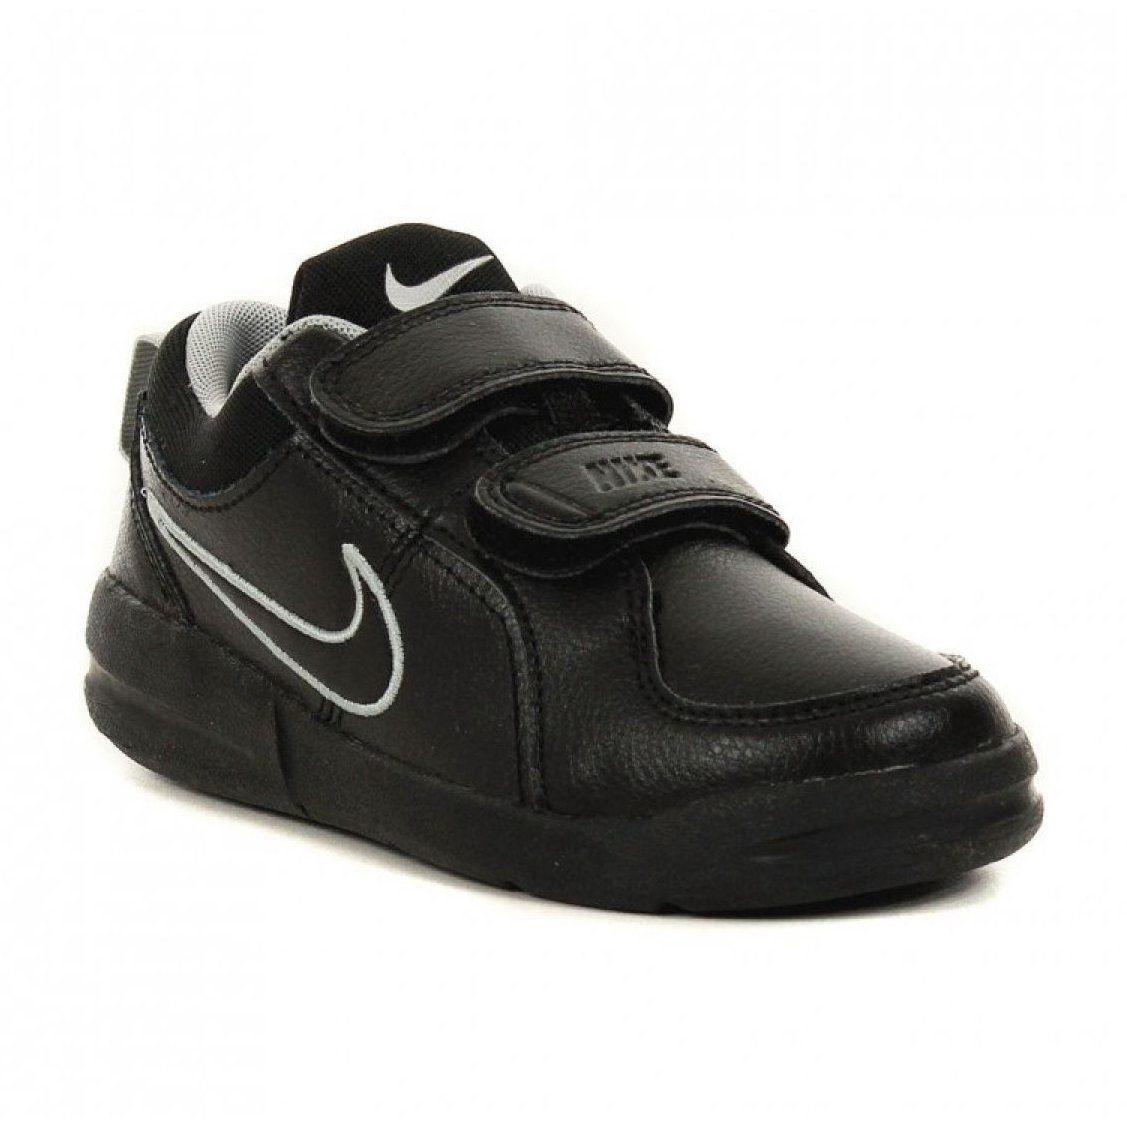 Nike Pico 4 Jr 454500 001 Shoes Black Black Shoes Kid Shoes Nike